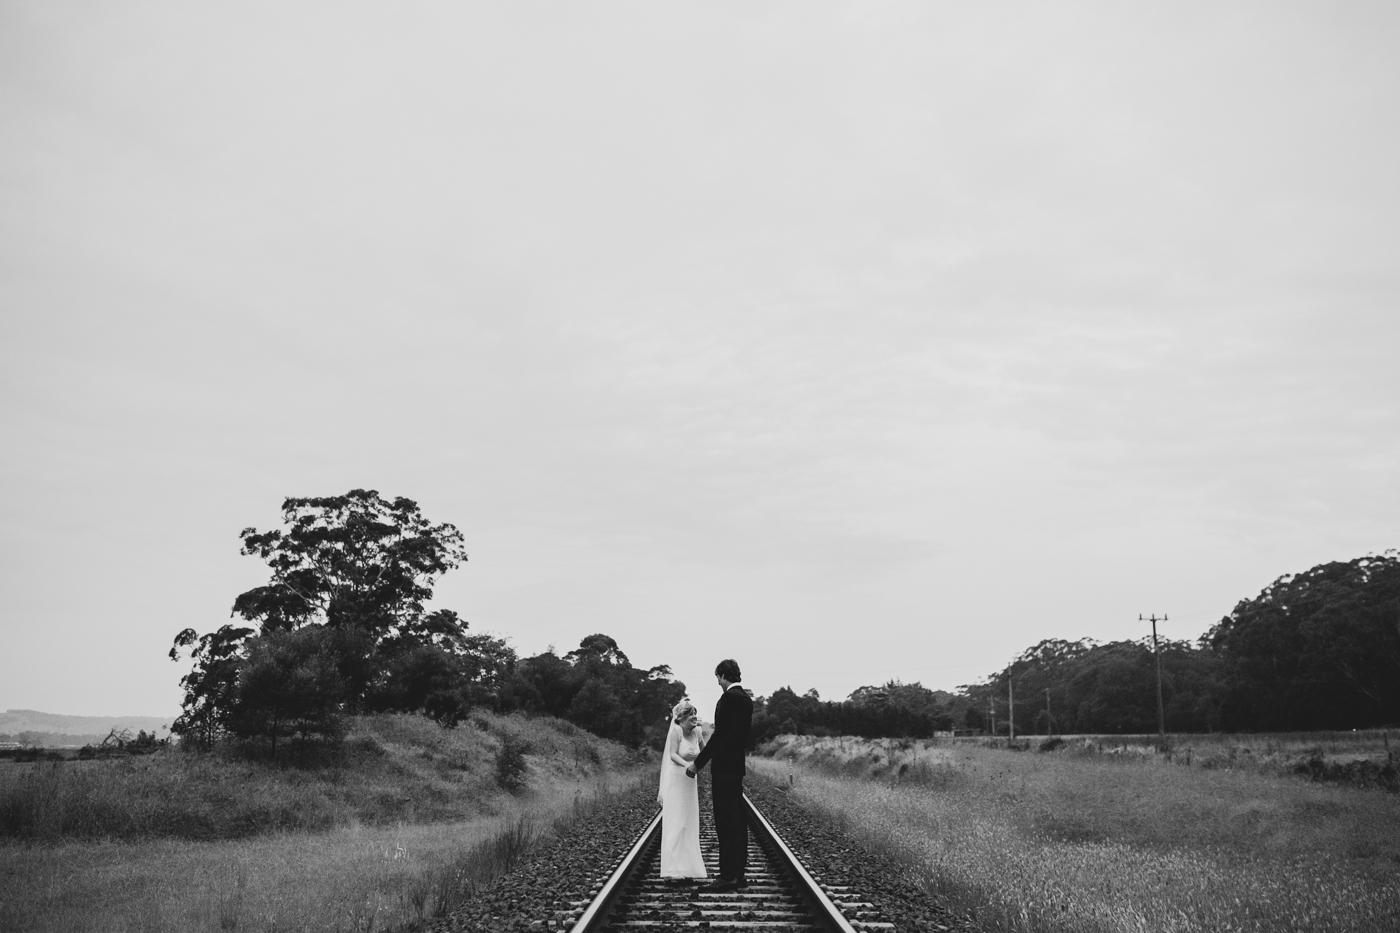 Rachel & Jacob - Willow Farm Berry - South Coast Wedding - Samantha Heather Photography-168.jpg